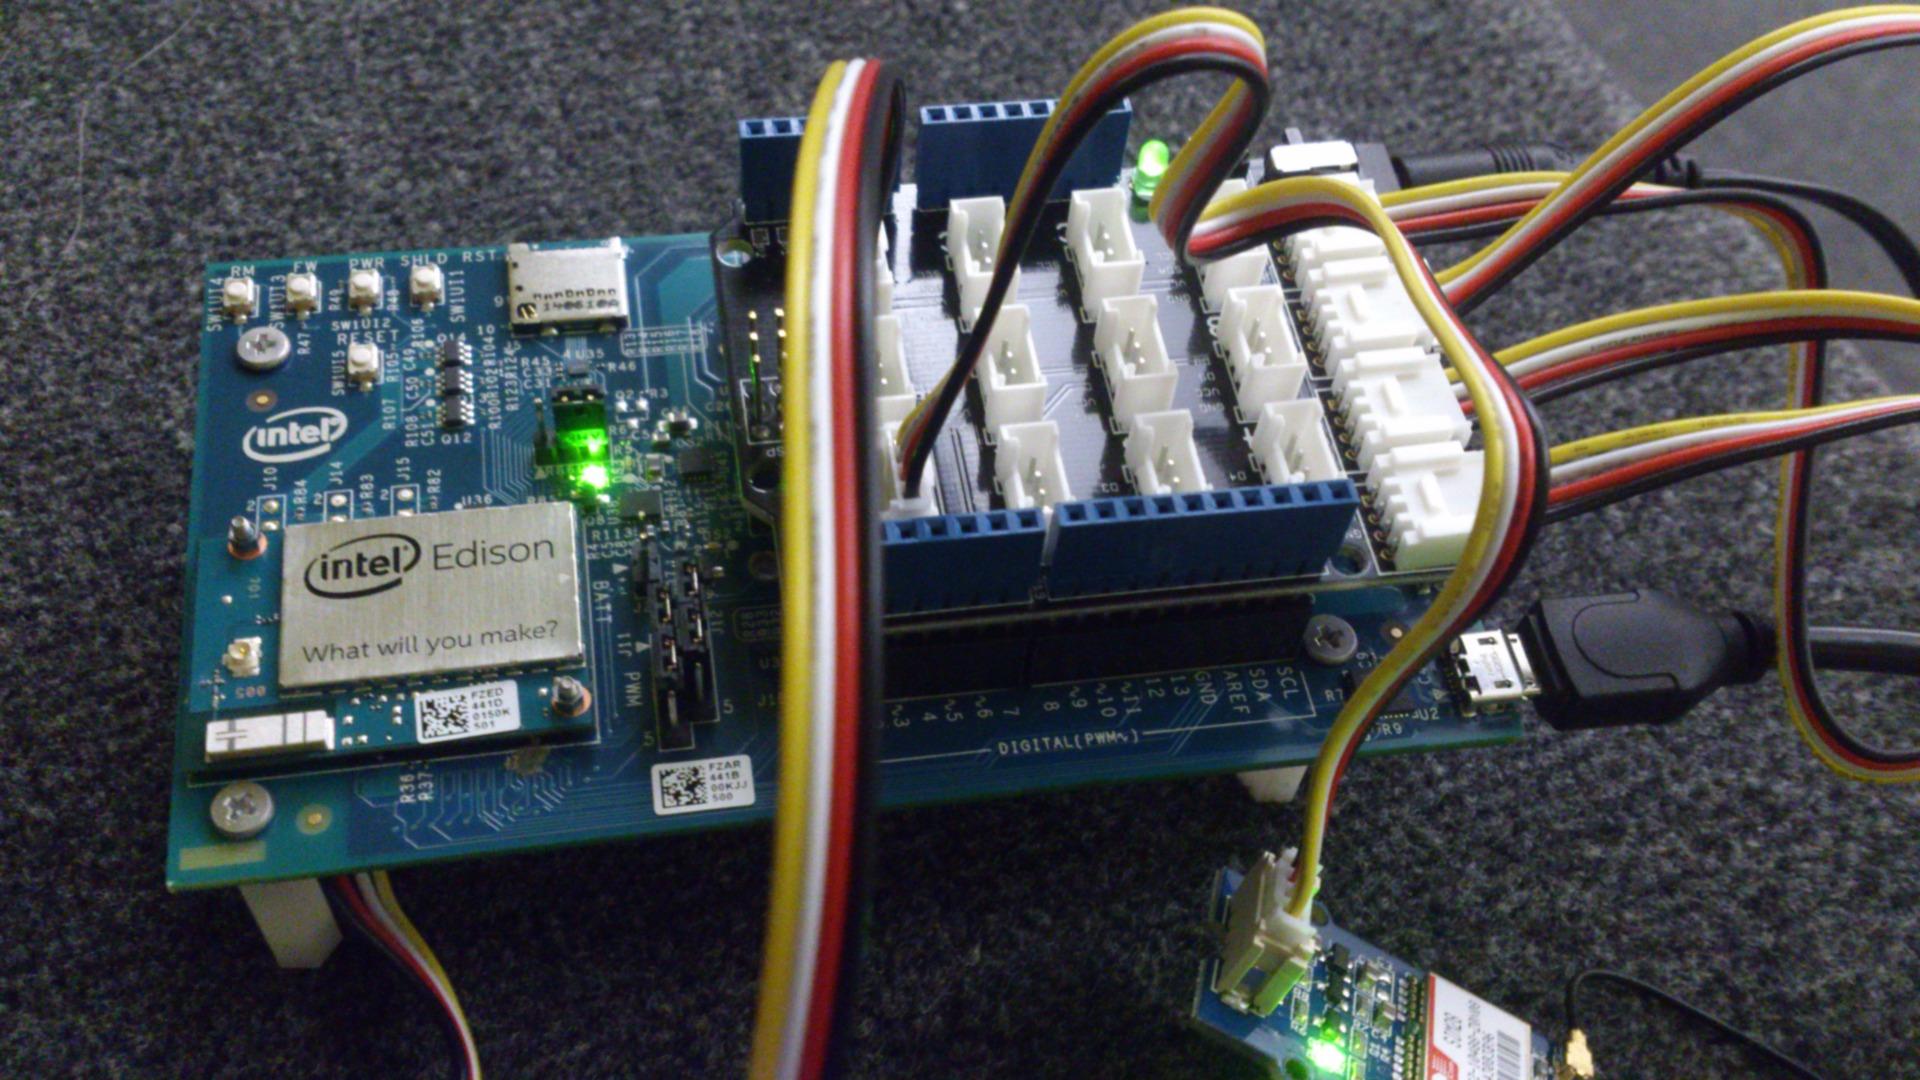 Picture of Intel Edison + Breakout Kit + Base Shield